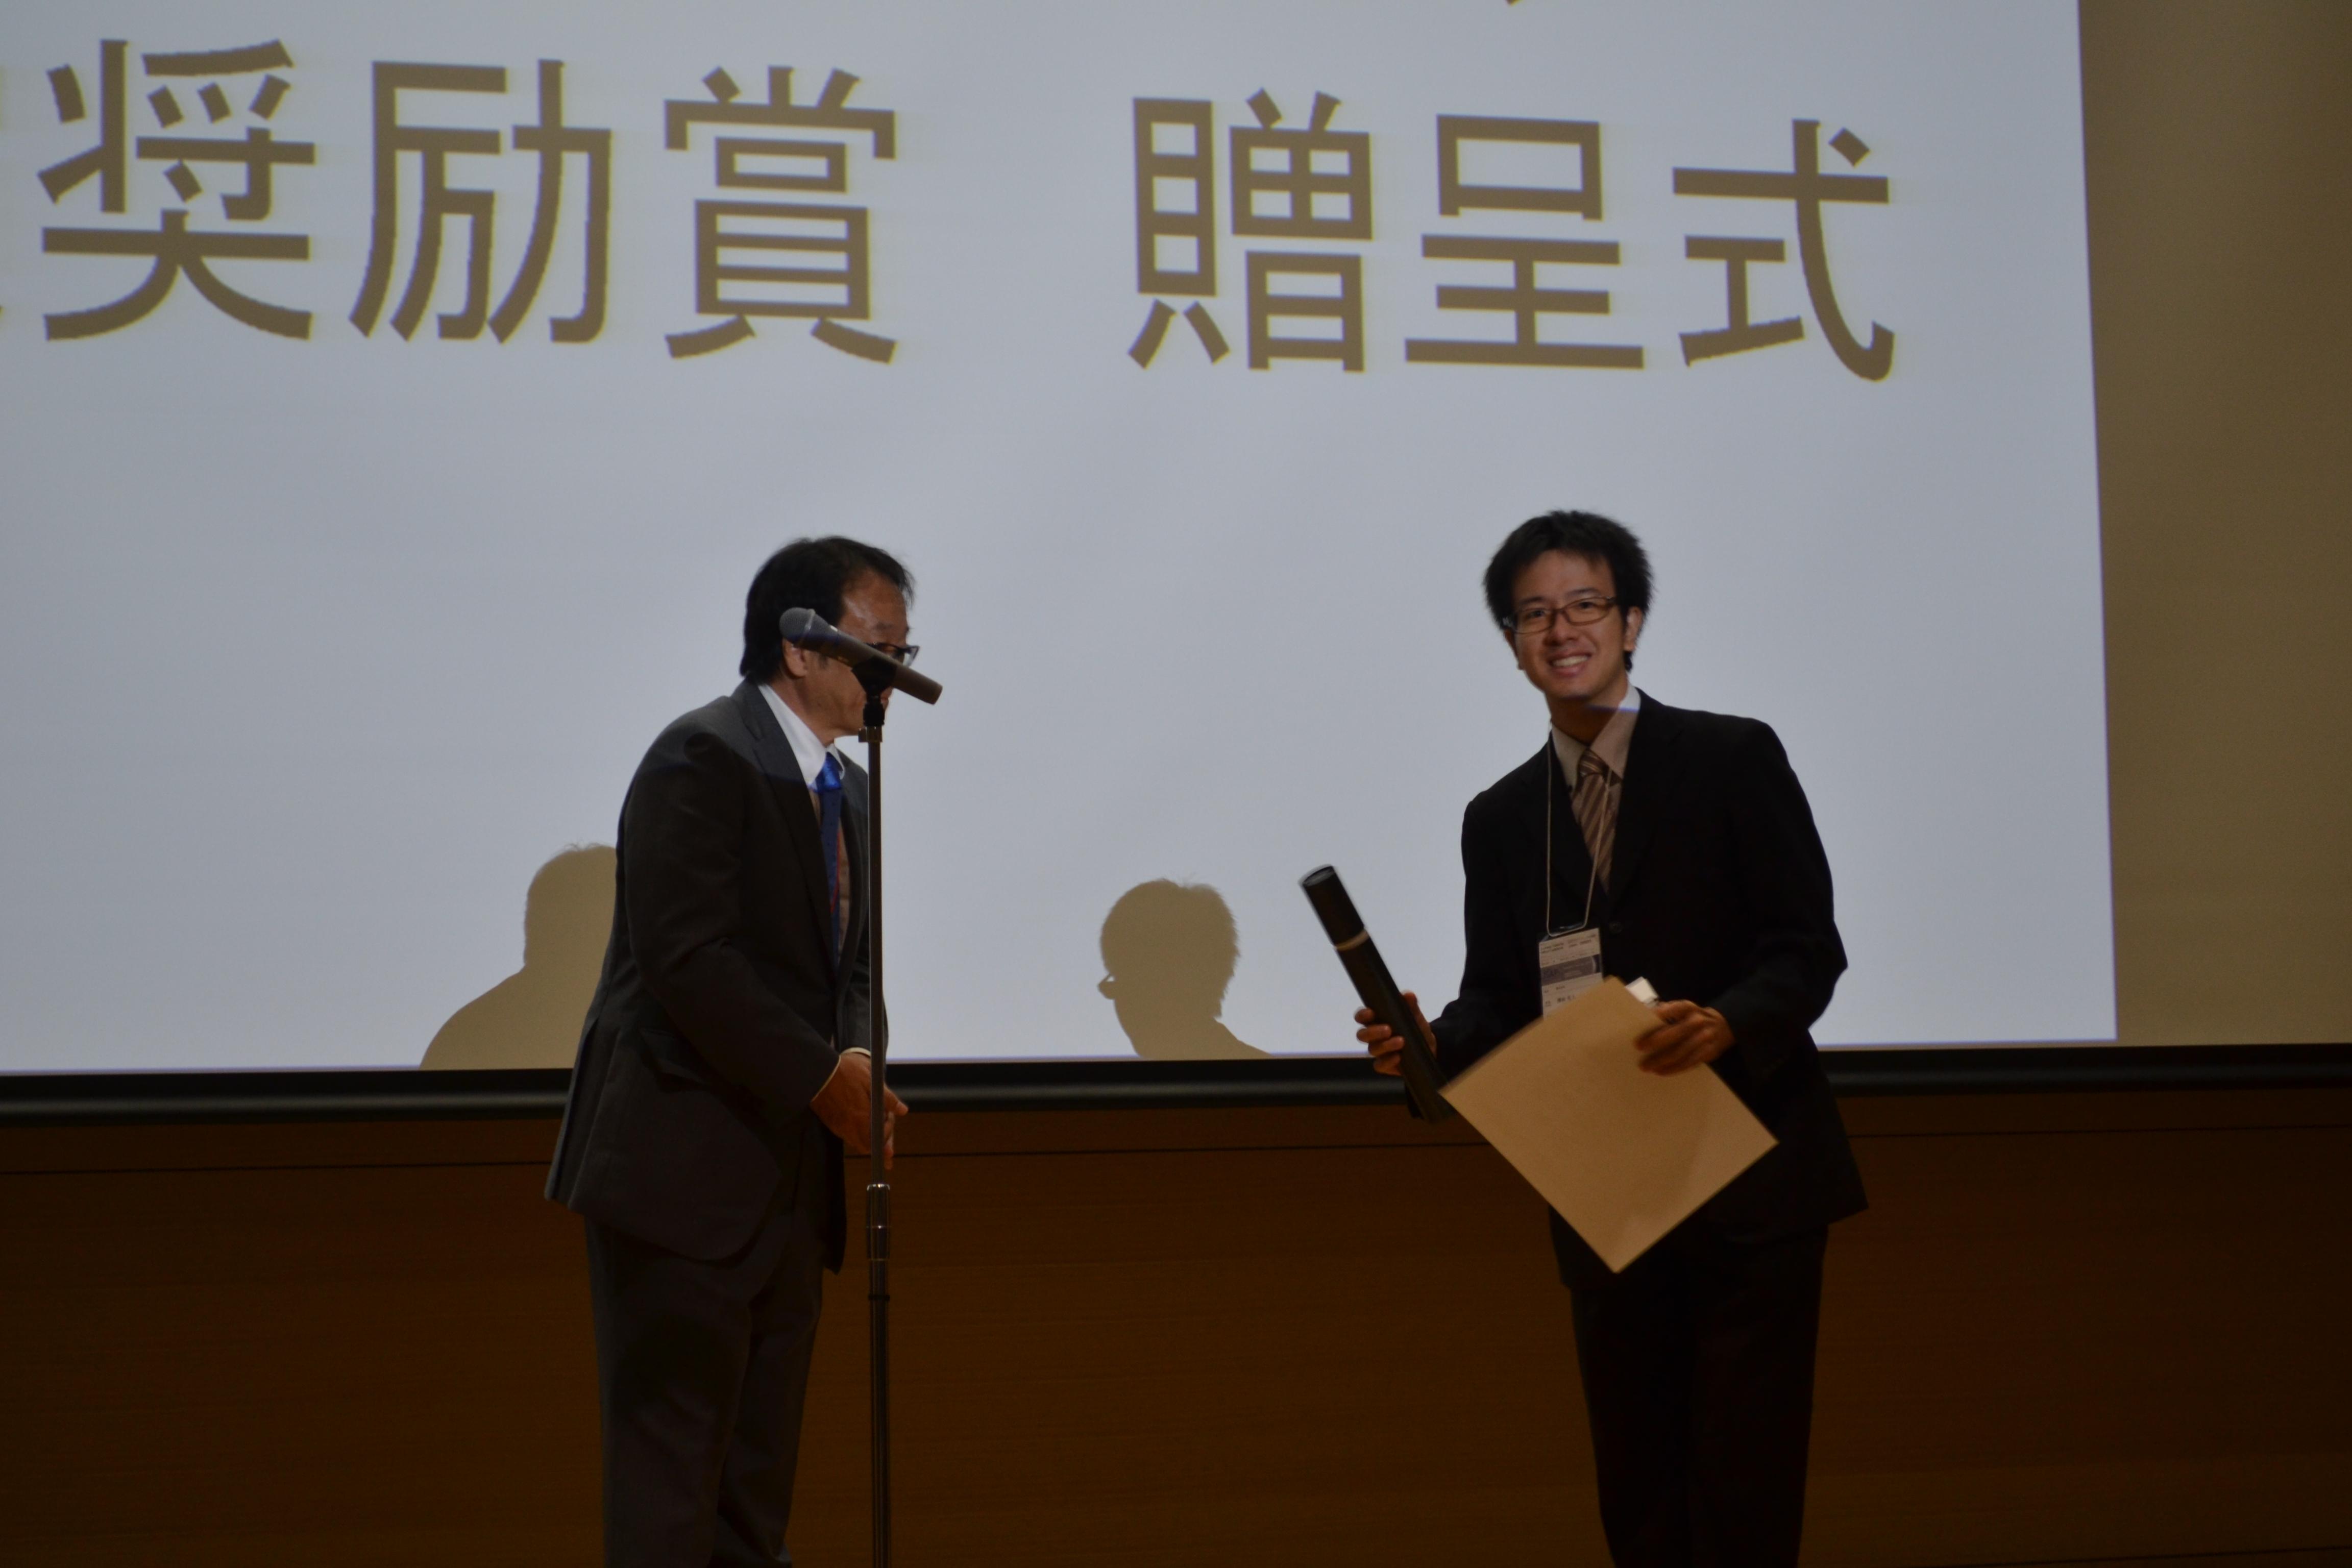 image for Ryohto Sawada (D3) received an award!